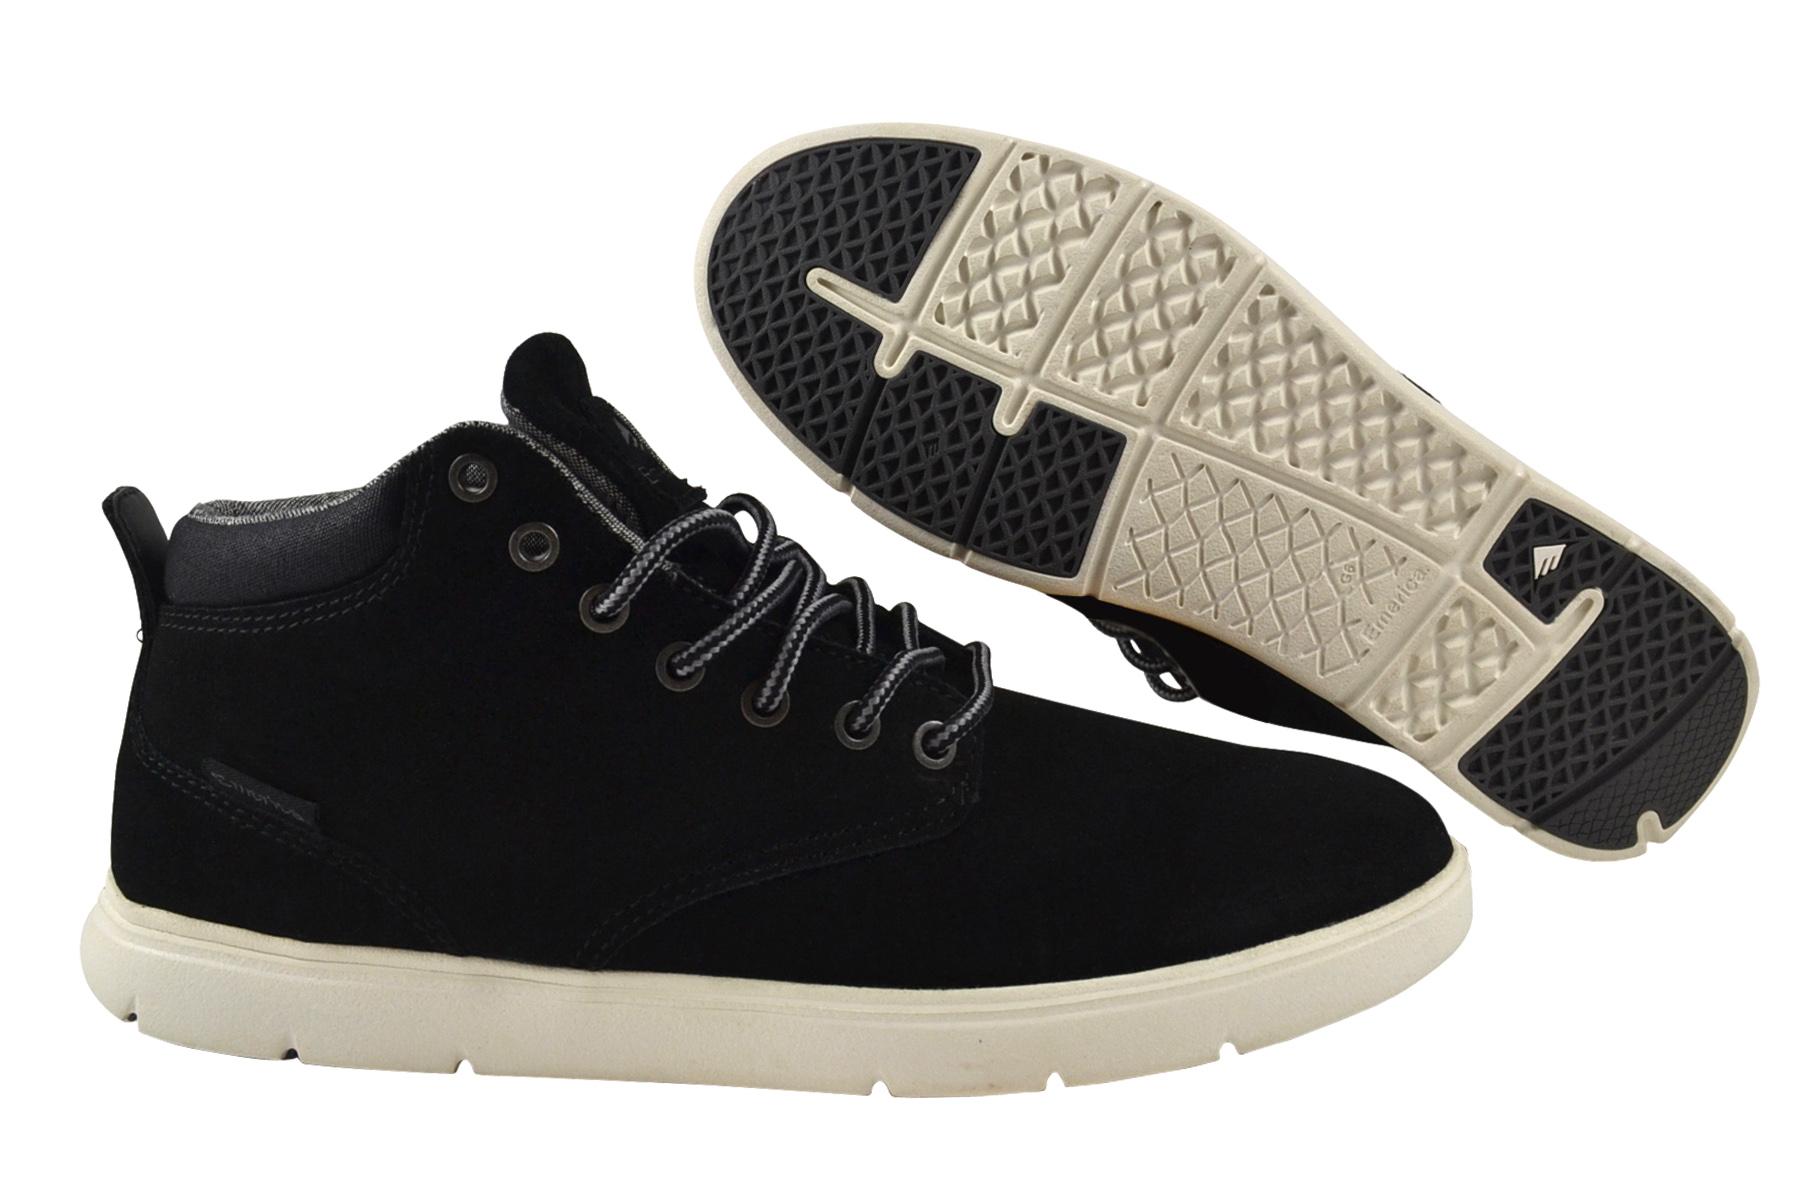 30f4abacf63111 Emerica Wino Cruiser HLT black white Sneaker Schuhe schwarz